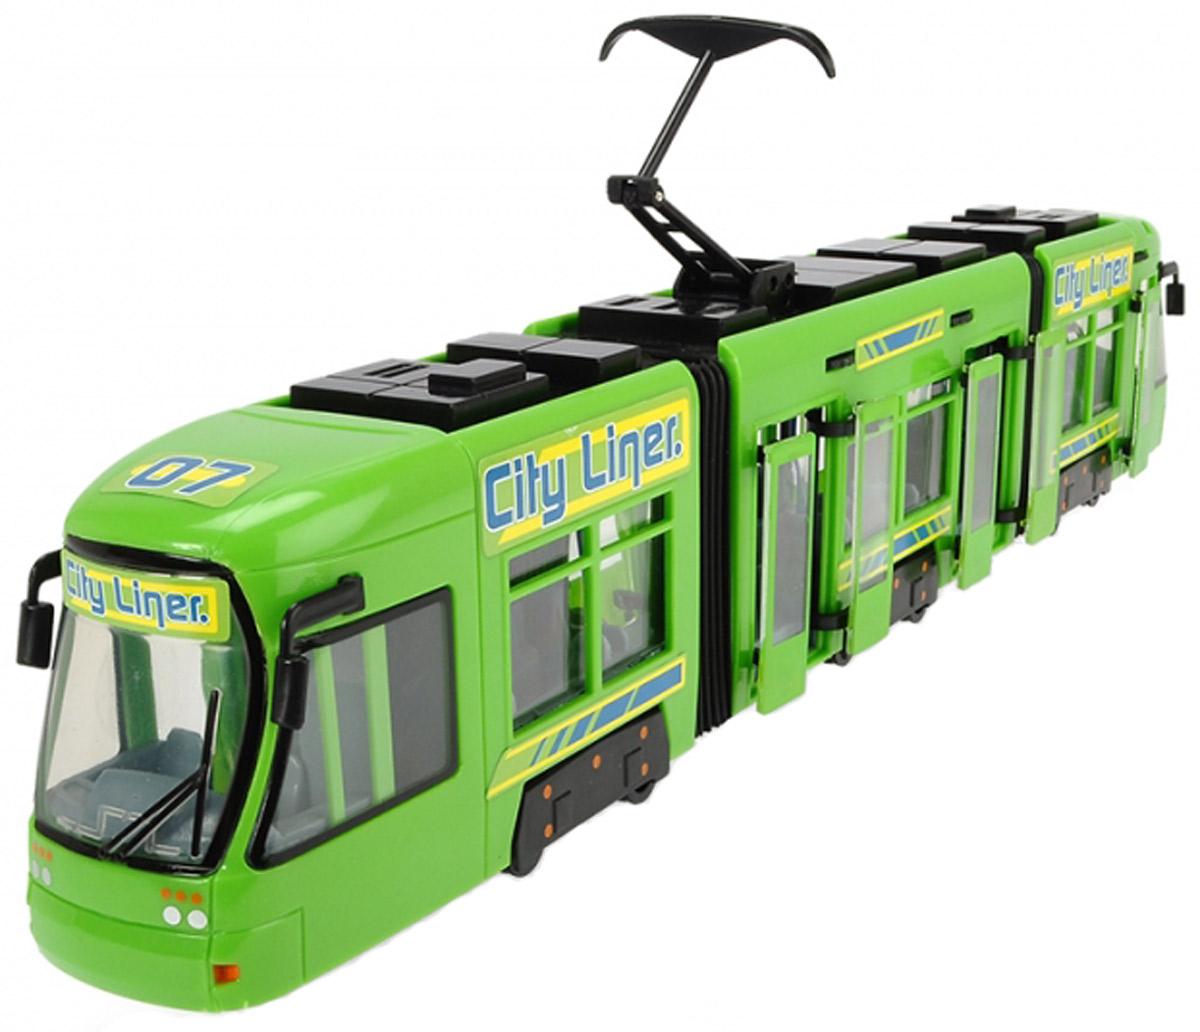 Dickie Toys Городской трамвай цвет зеленый dickie toys городской трамвай